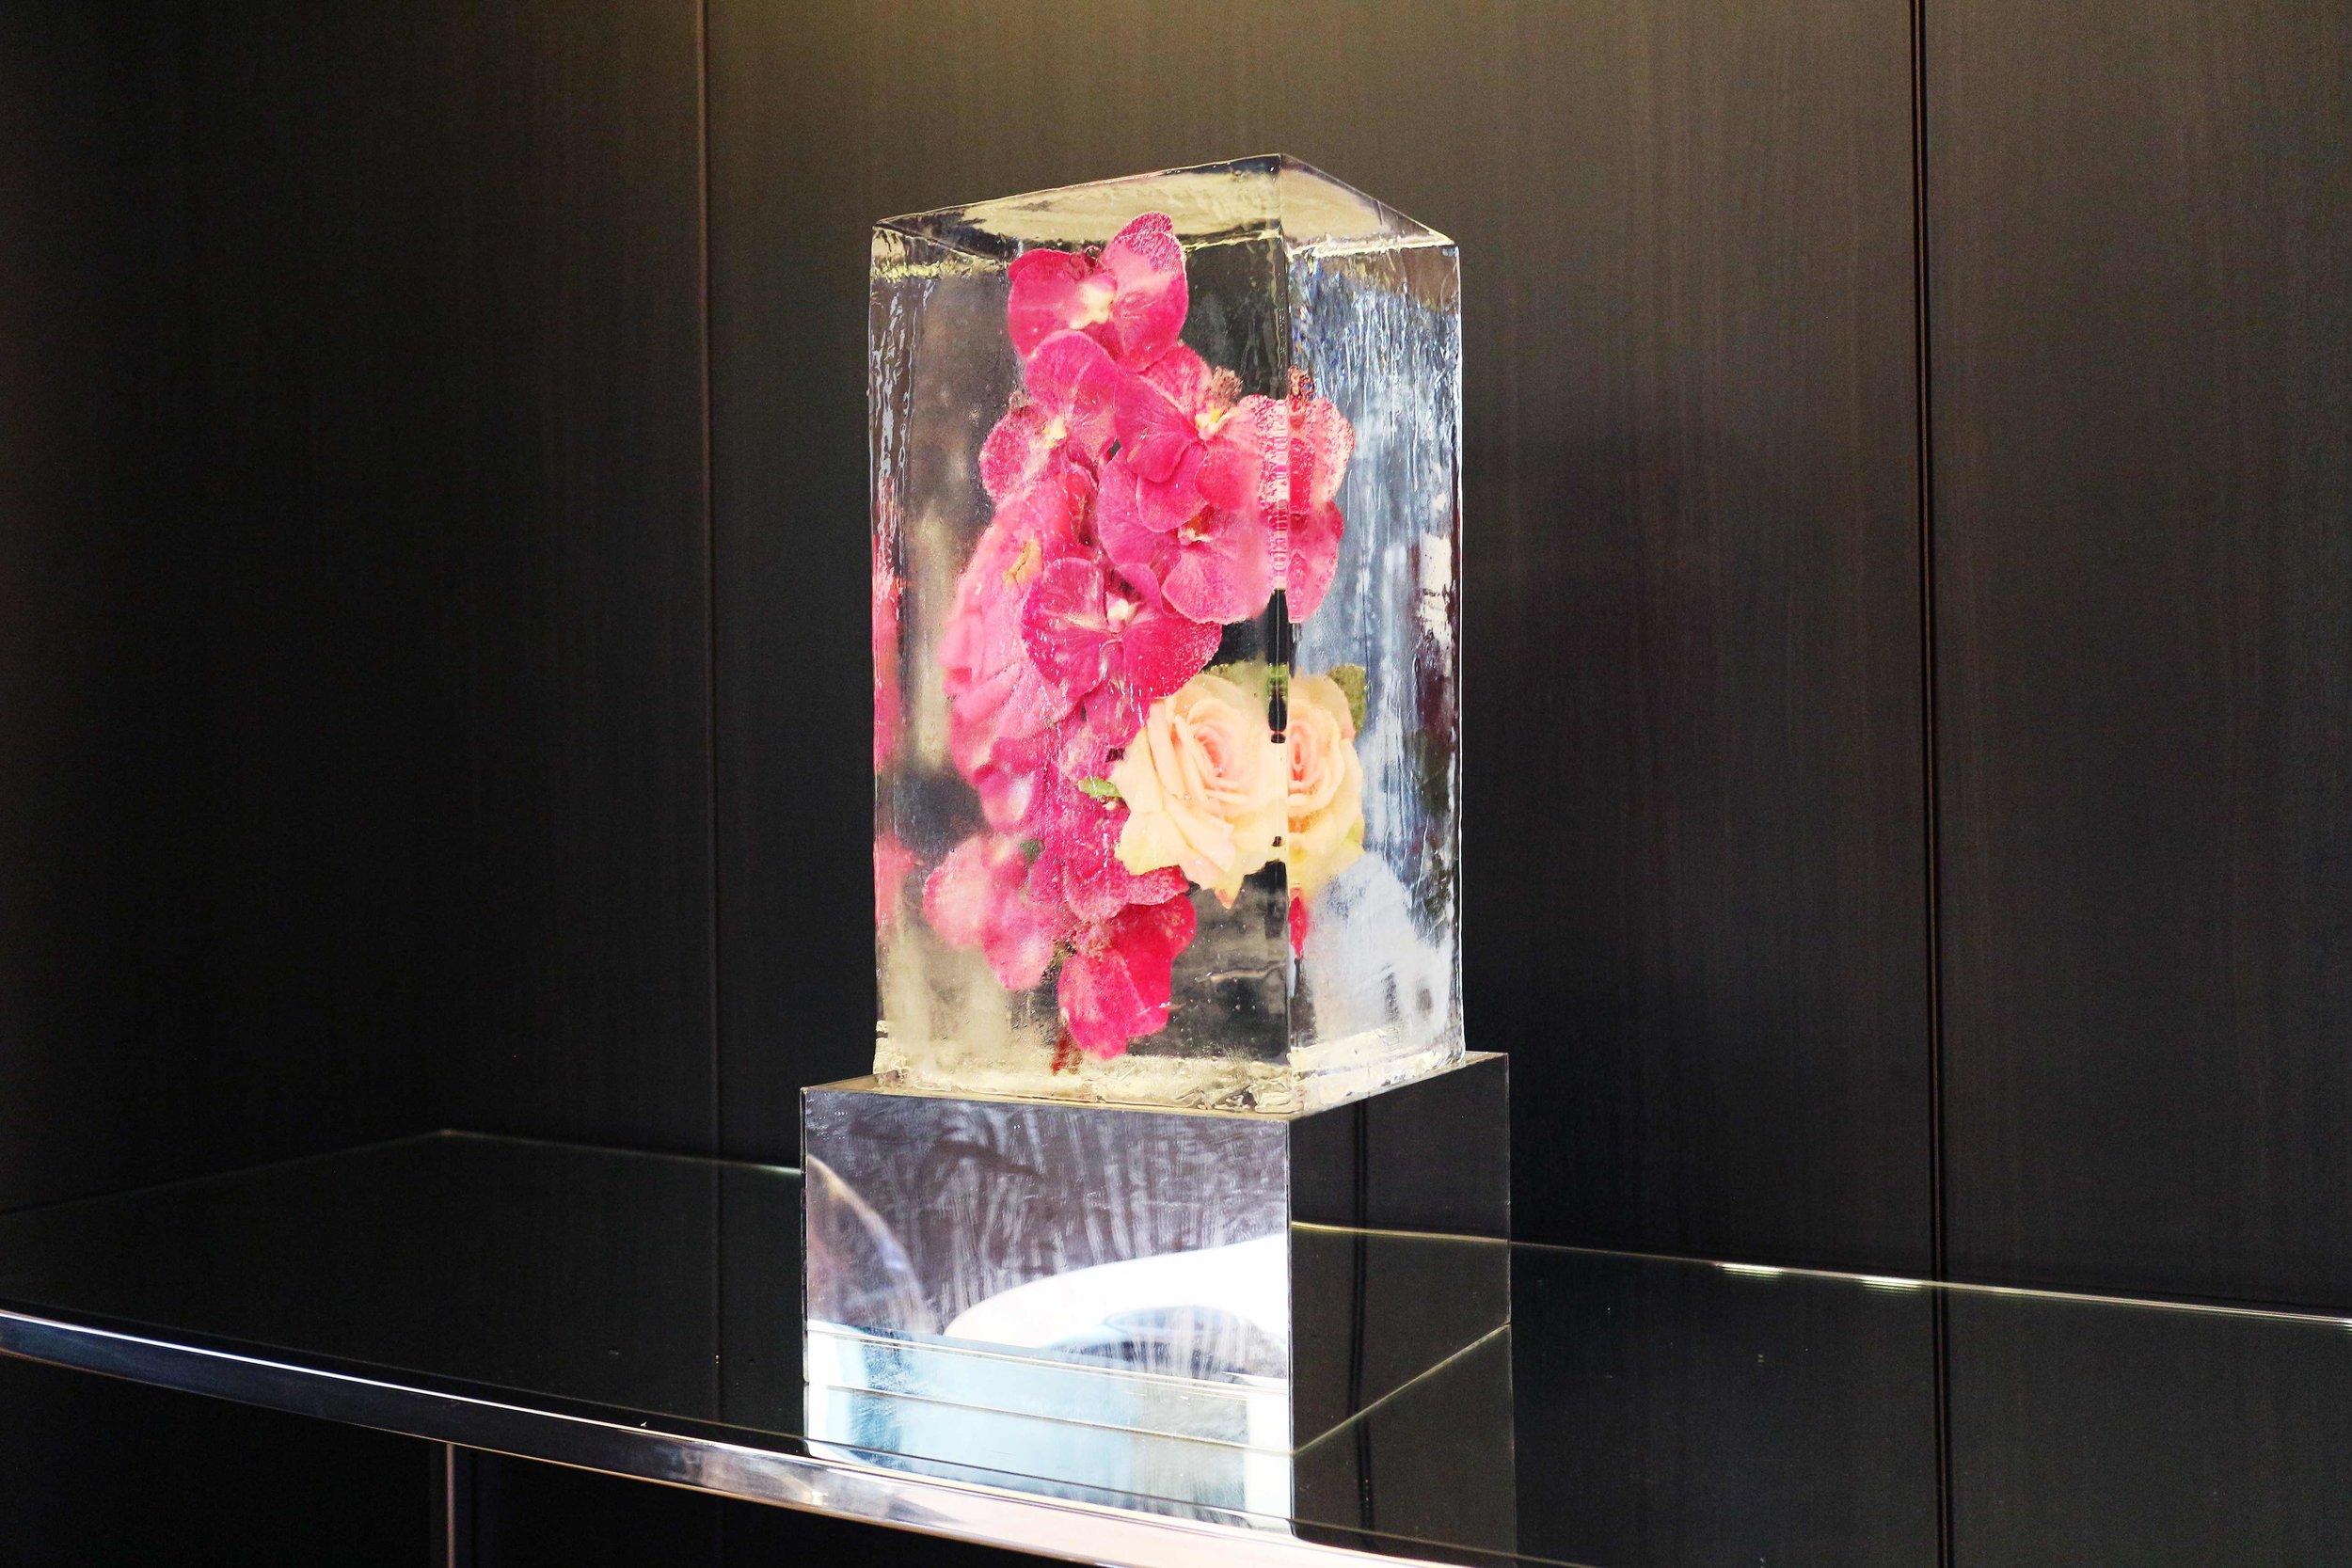 small-Original-20170719_Flowers_Frozen_Tabletop_Pedestal_Corporate_Event_Elizabeth_Arden 2.jpg